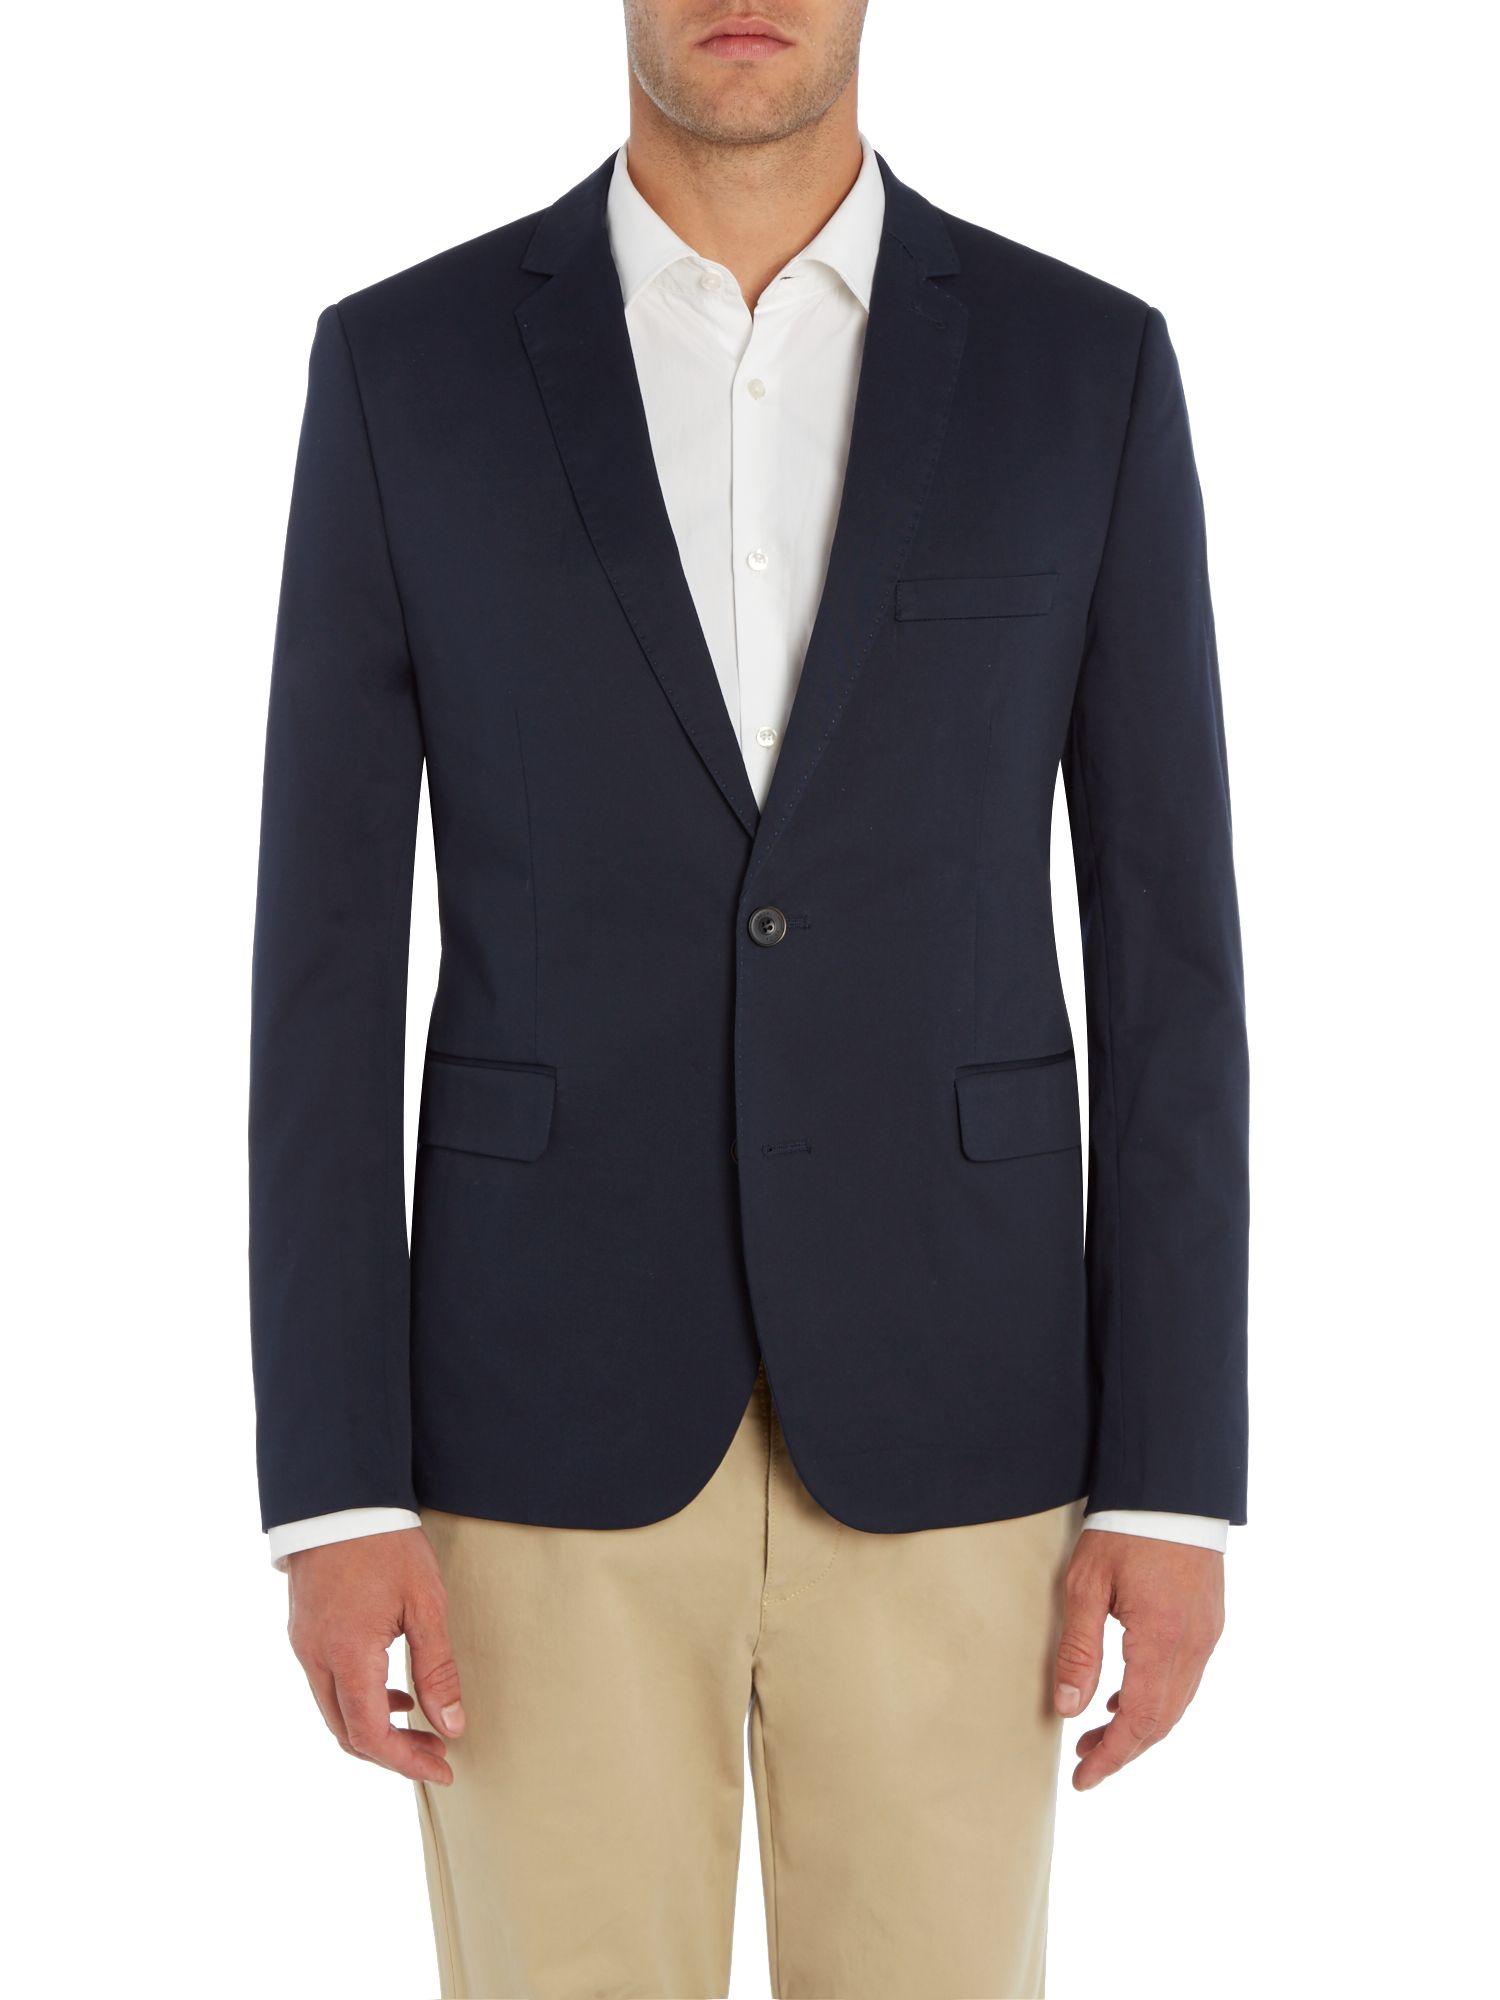 Blazers & Sport Coats Back to Men; Apply. Filter By clear all. Free Pick Up In Store Blazers (88) Casual (3) Dinner Jackets (58) Seasonal (2) Sport Coats () Lauren Ralph Lauren Men's Classic-Fit Ultra Tech Bright Navy Solid Pocket Blazer.